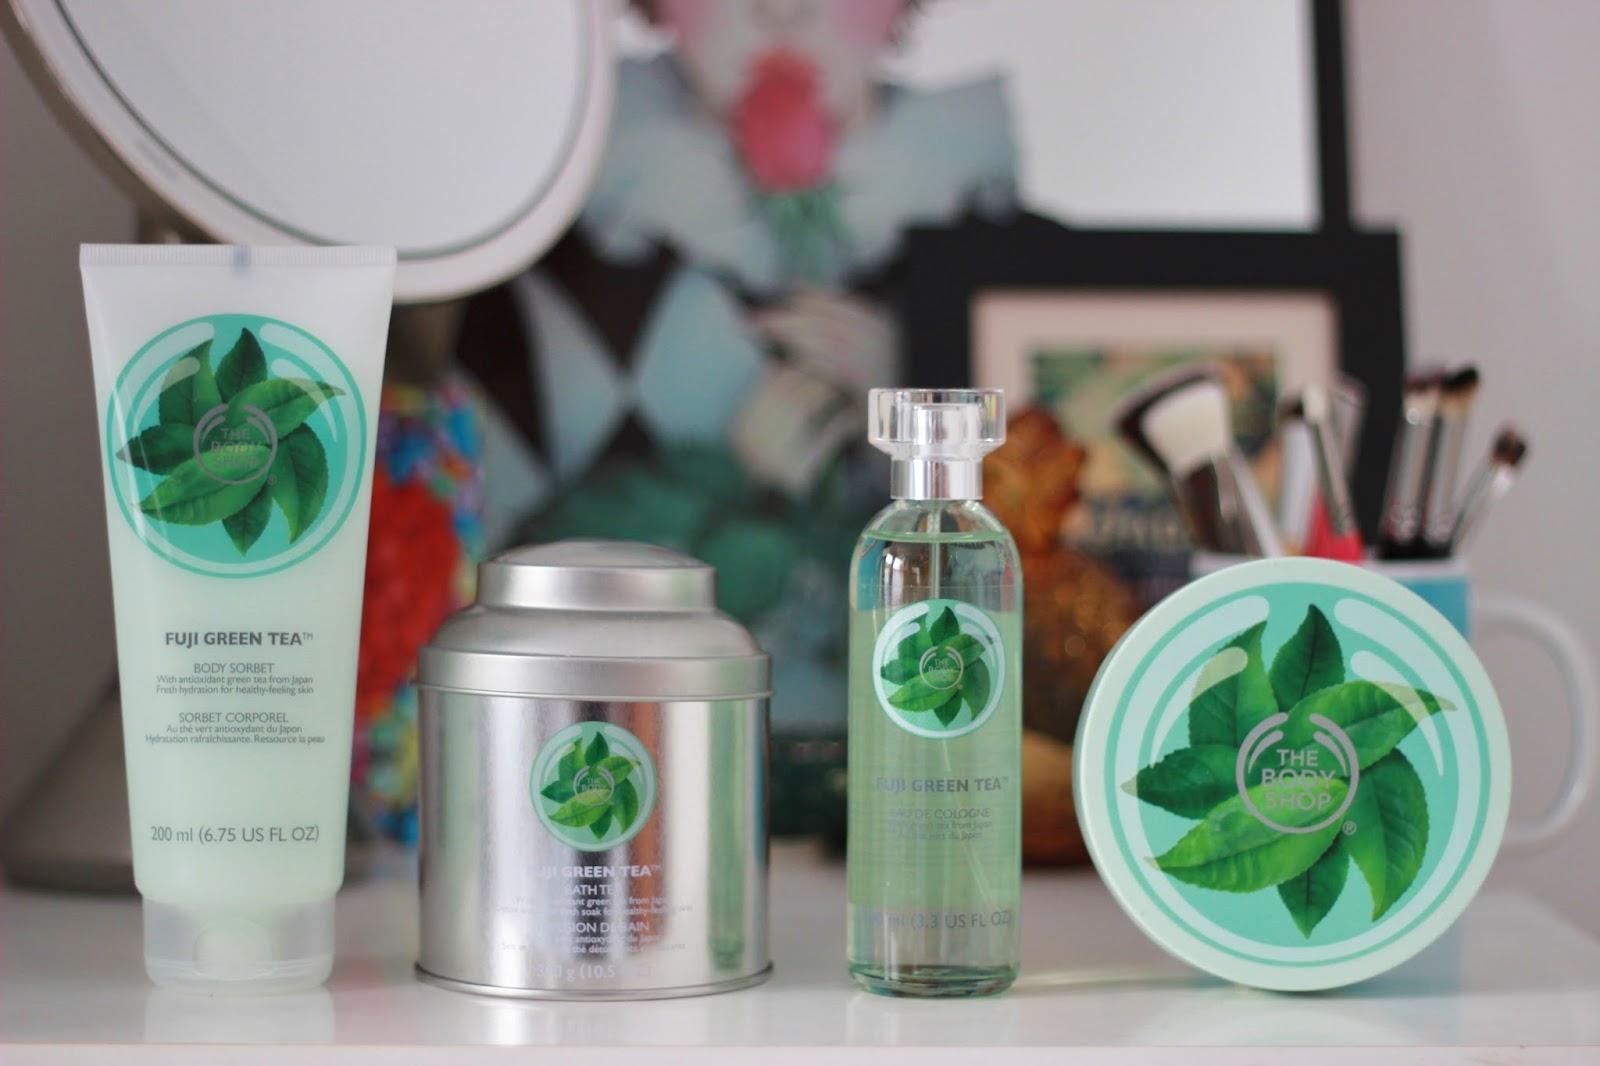 The Body Shop Fuji Green Tea bath and body range | Tales of a Pale ...